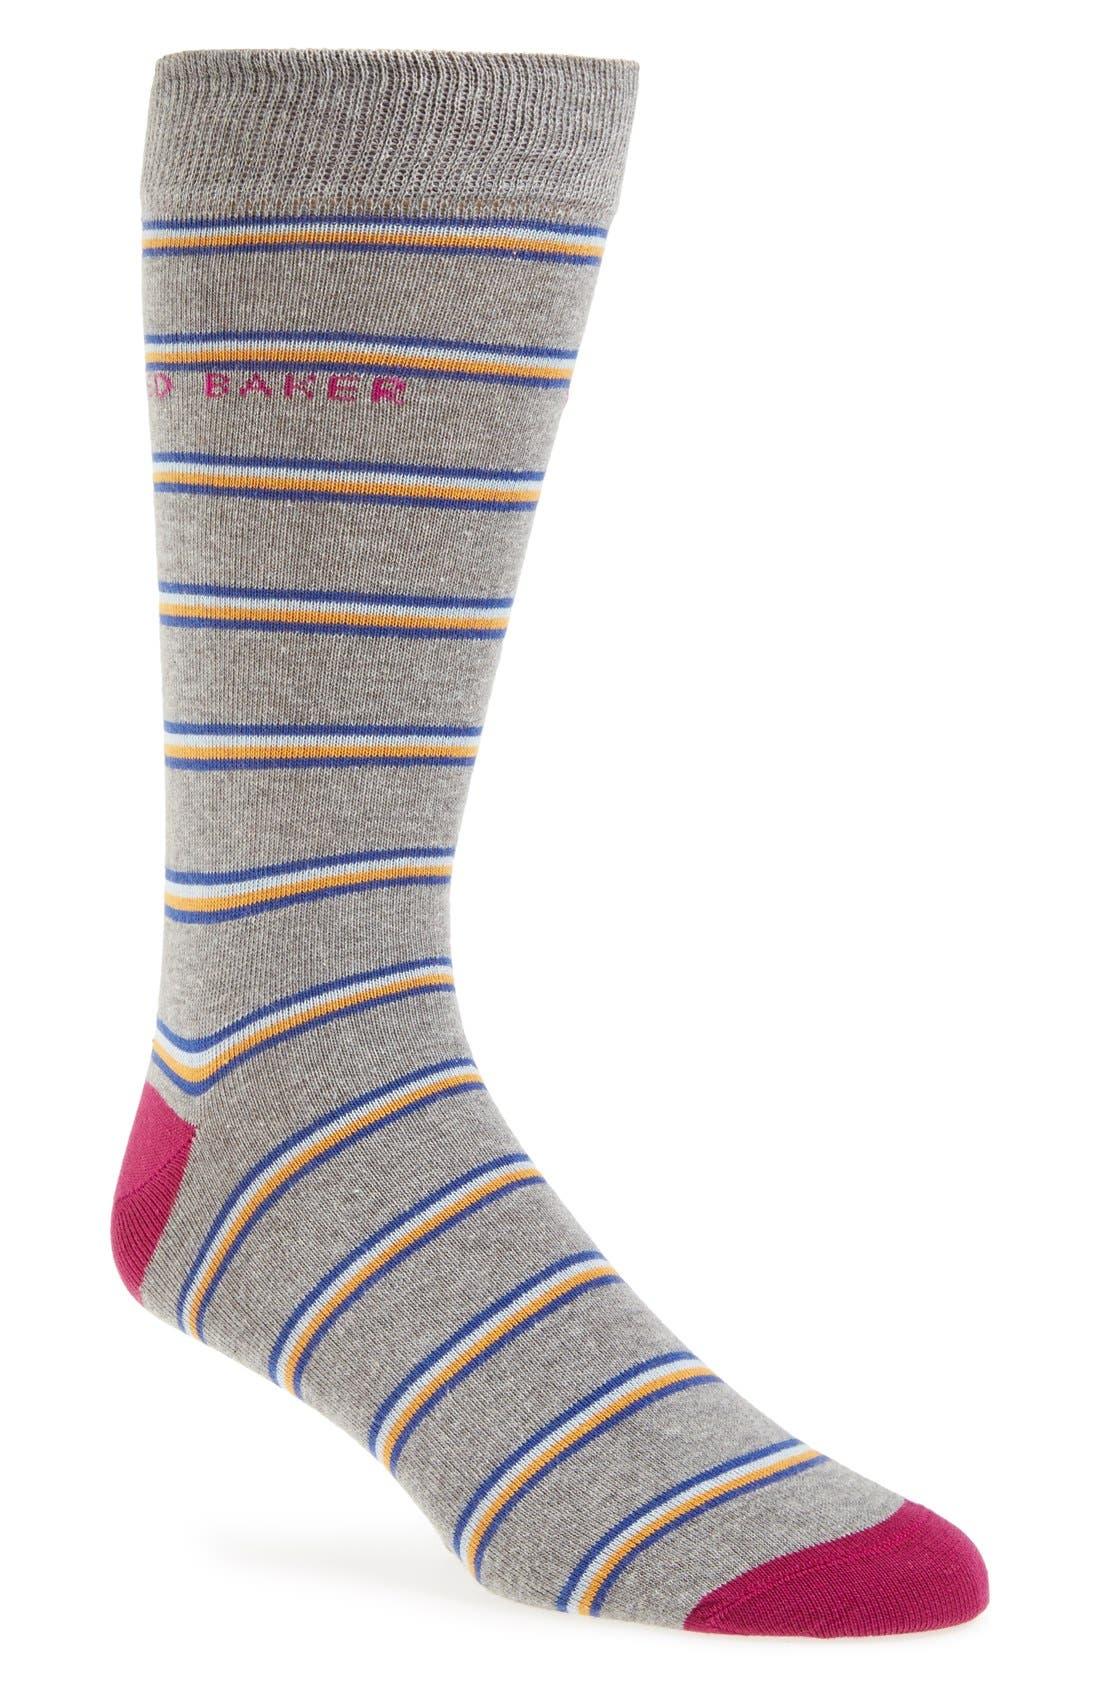 Alternate Image 1 Selected - Ted Baker London 'Bisskit' Stripe Socks